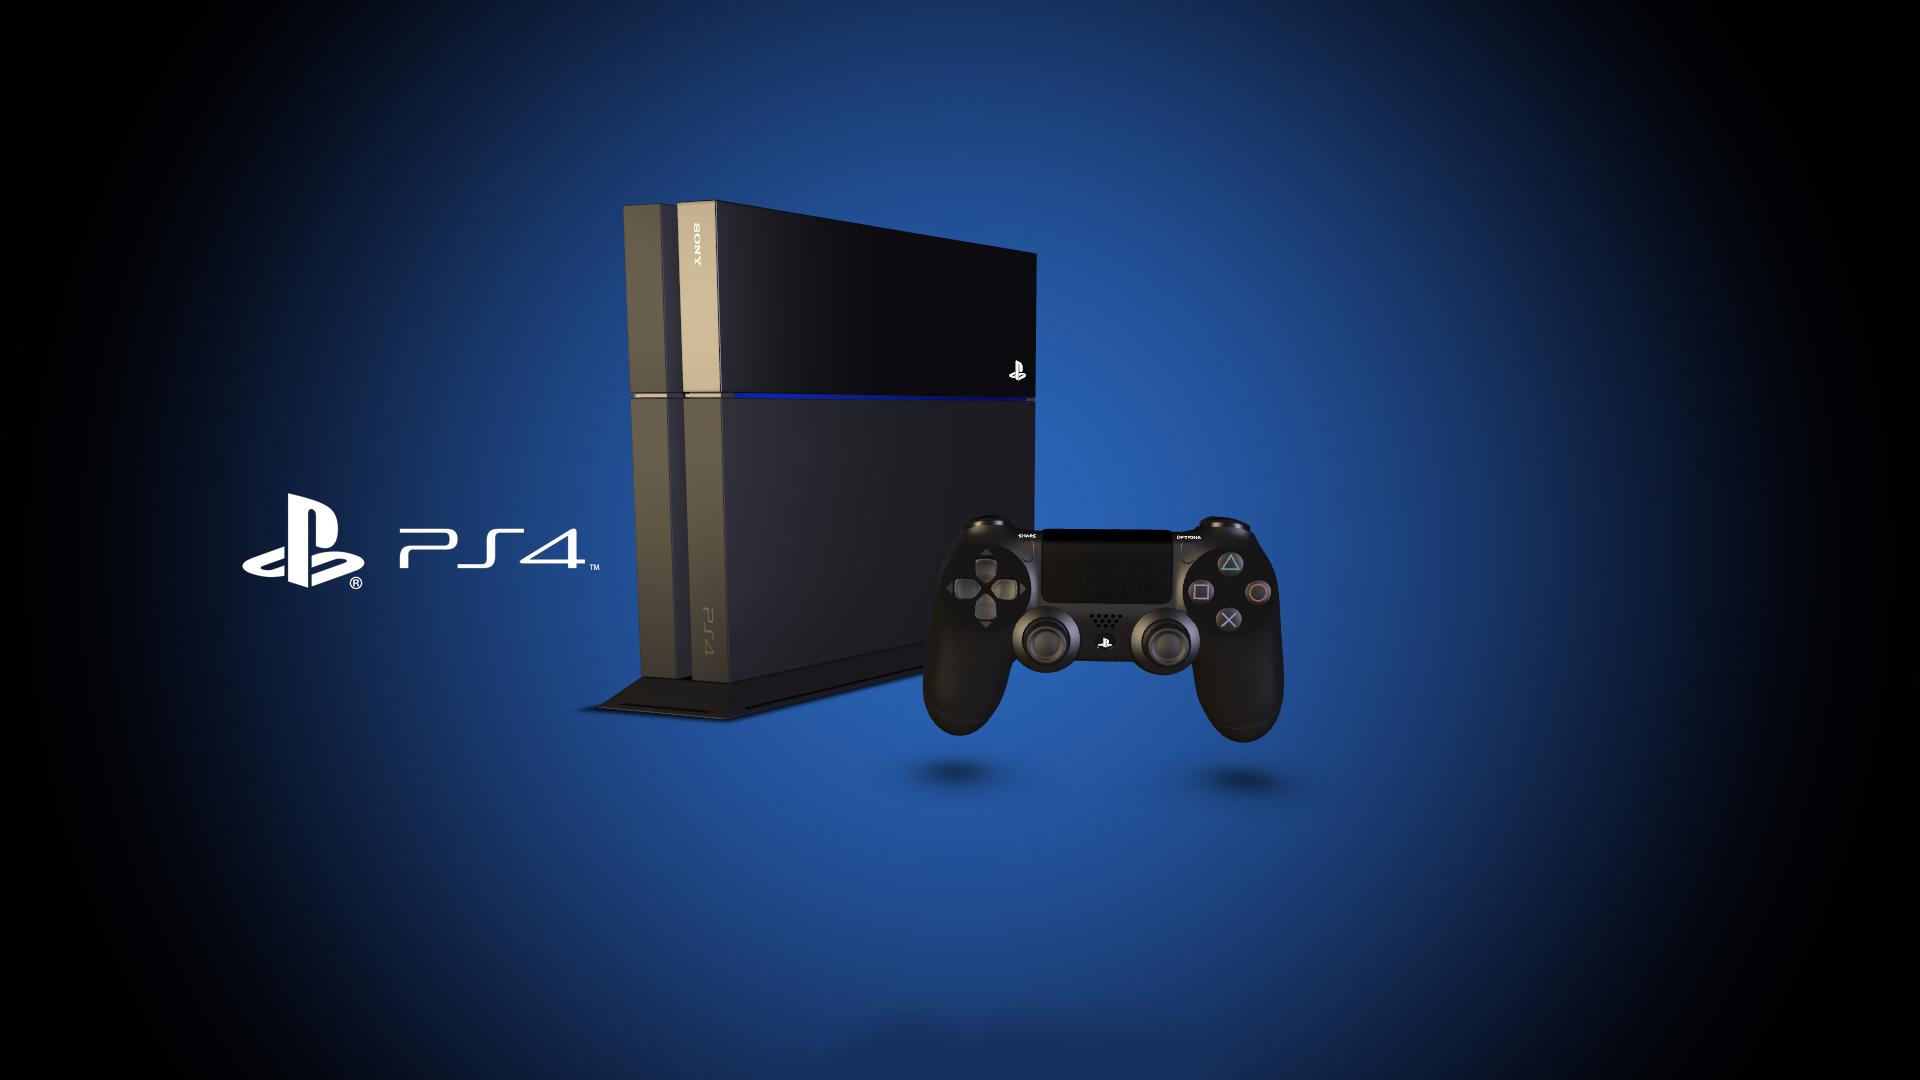 Playstation 4 Wallpaper 31881 1920x1080 px